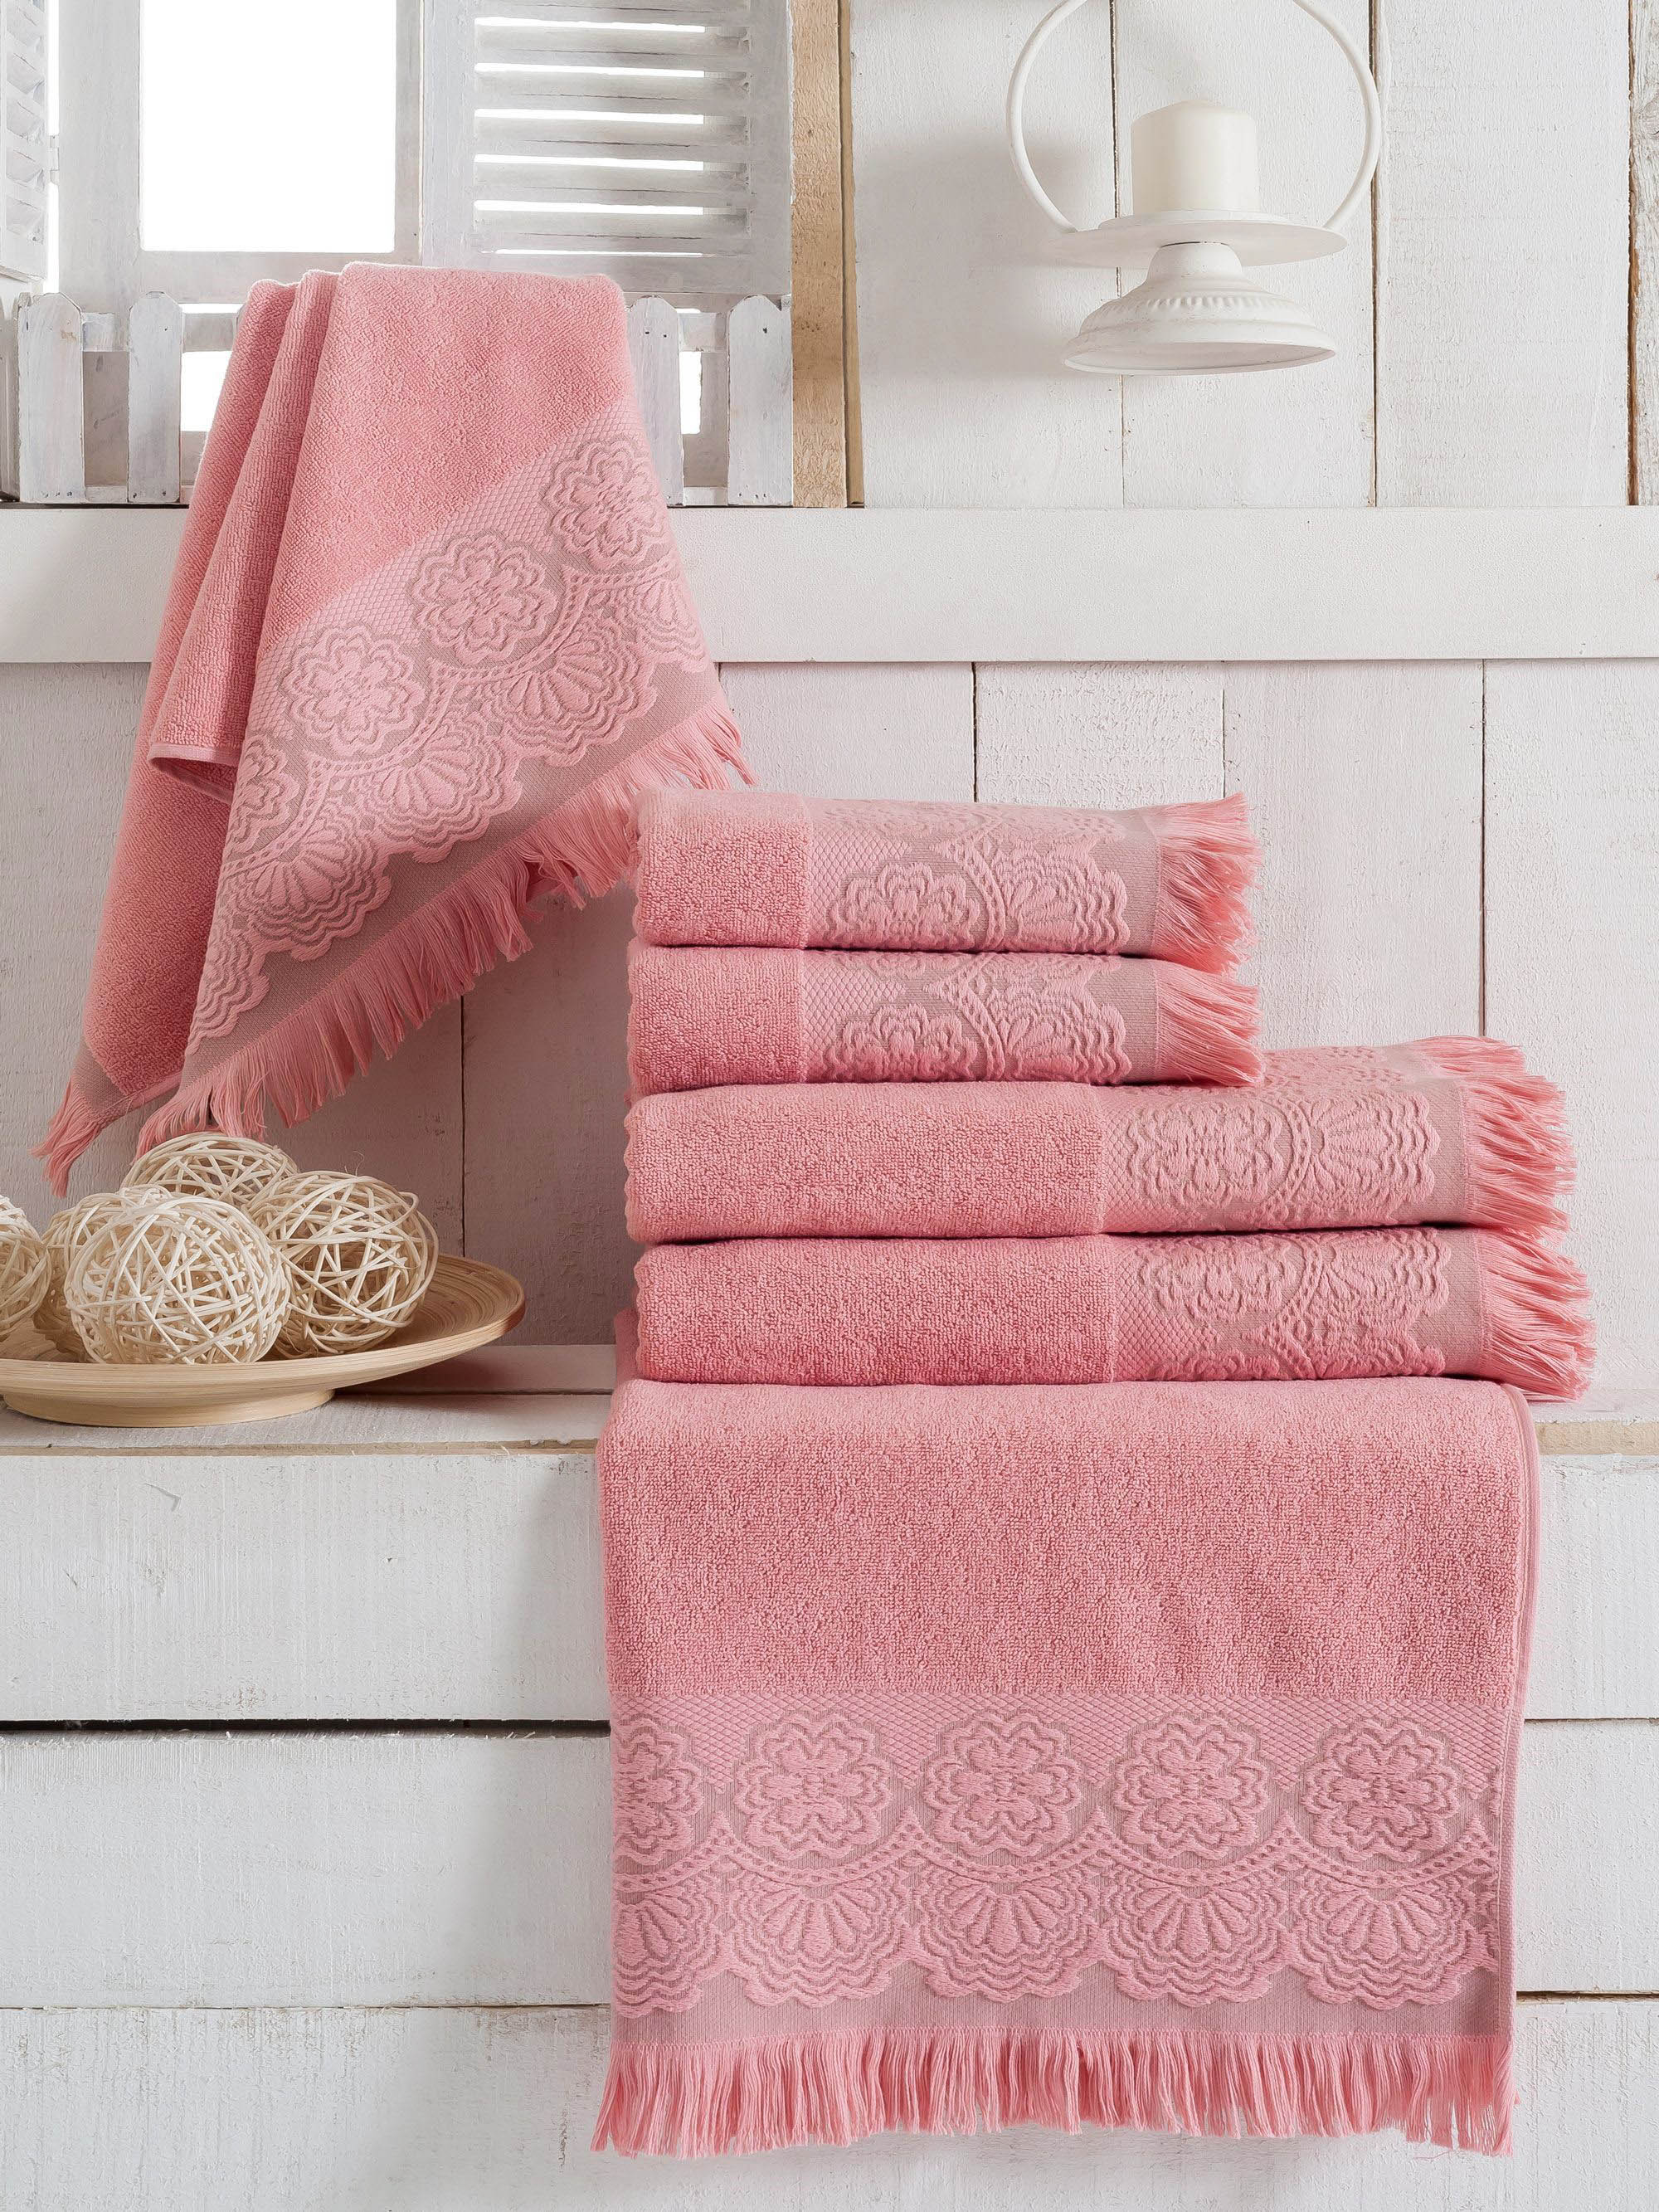 Полотенца Sokuculer Полотенце Zara Цвет: Розовый (50х90 см - 3 шт) pasta zara ракушка макароны 500 г